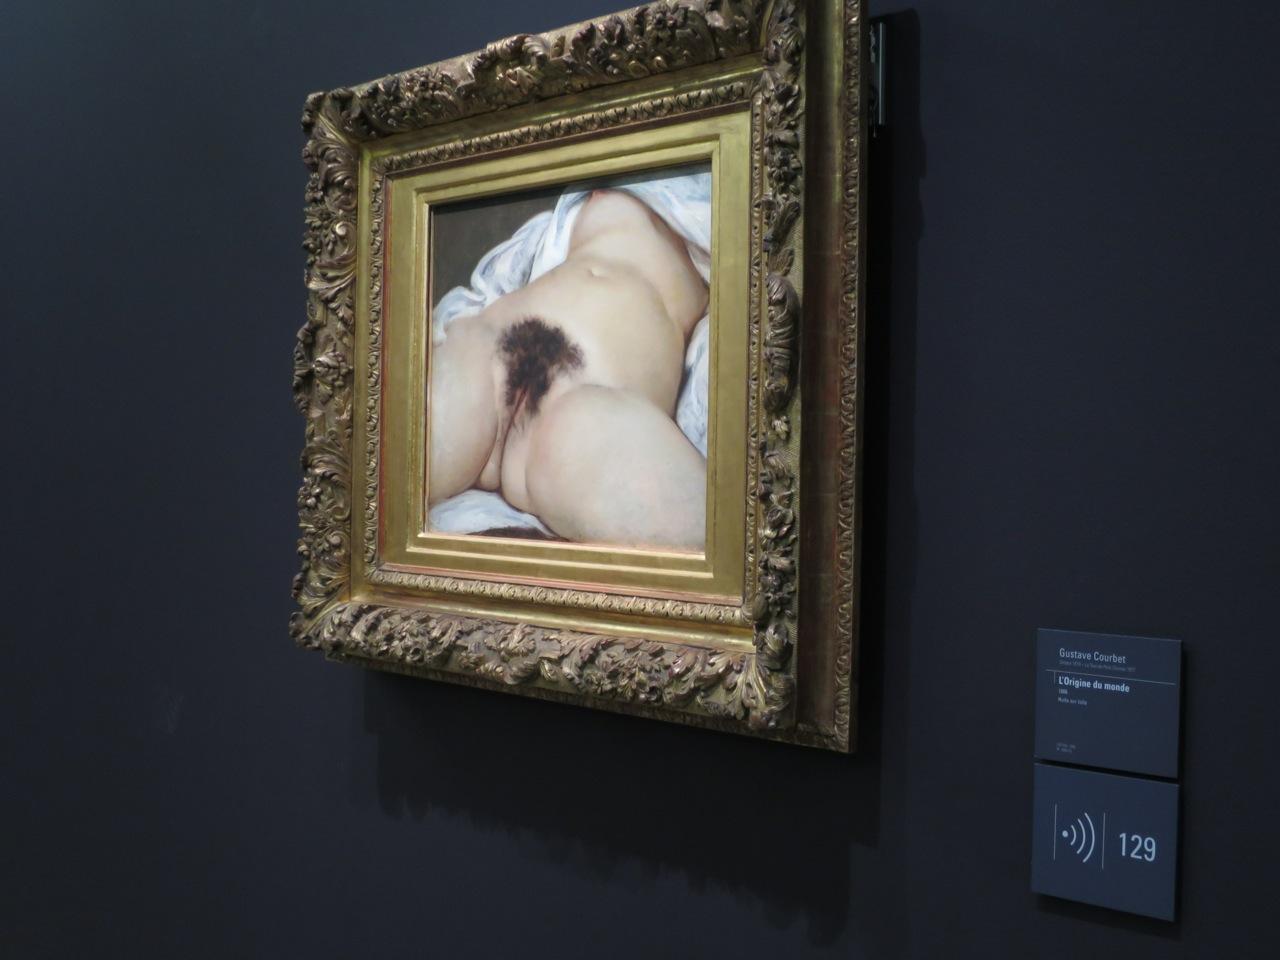 Paris 4-Musee d'Orsay 12